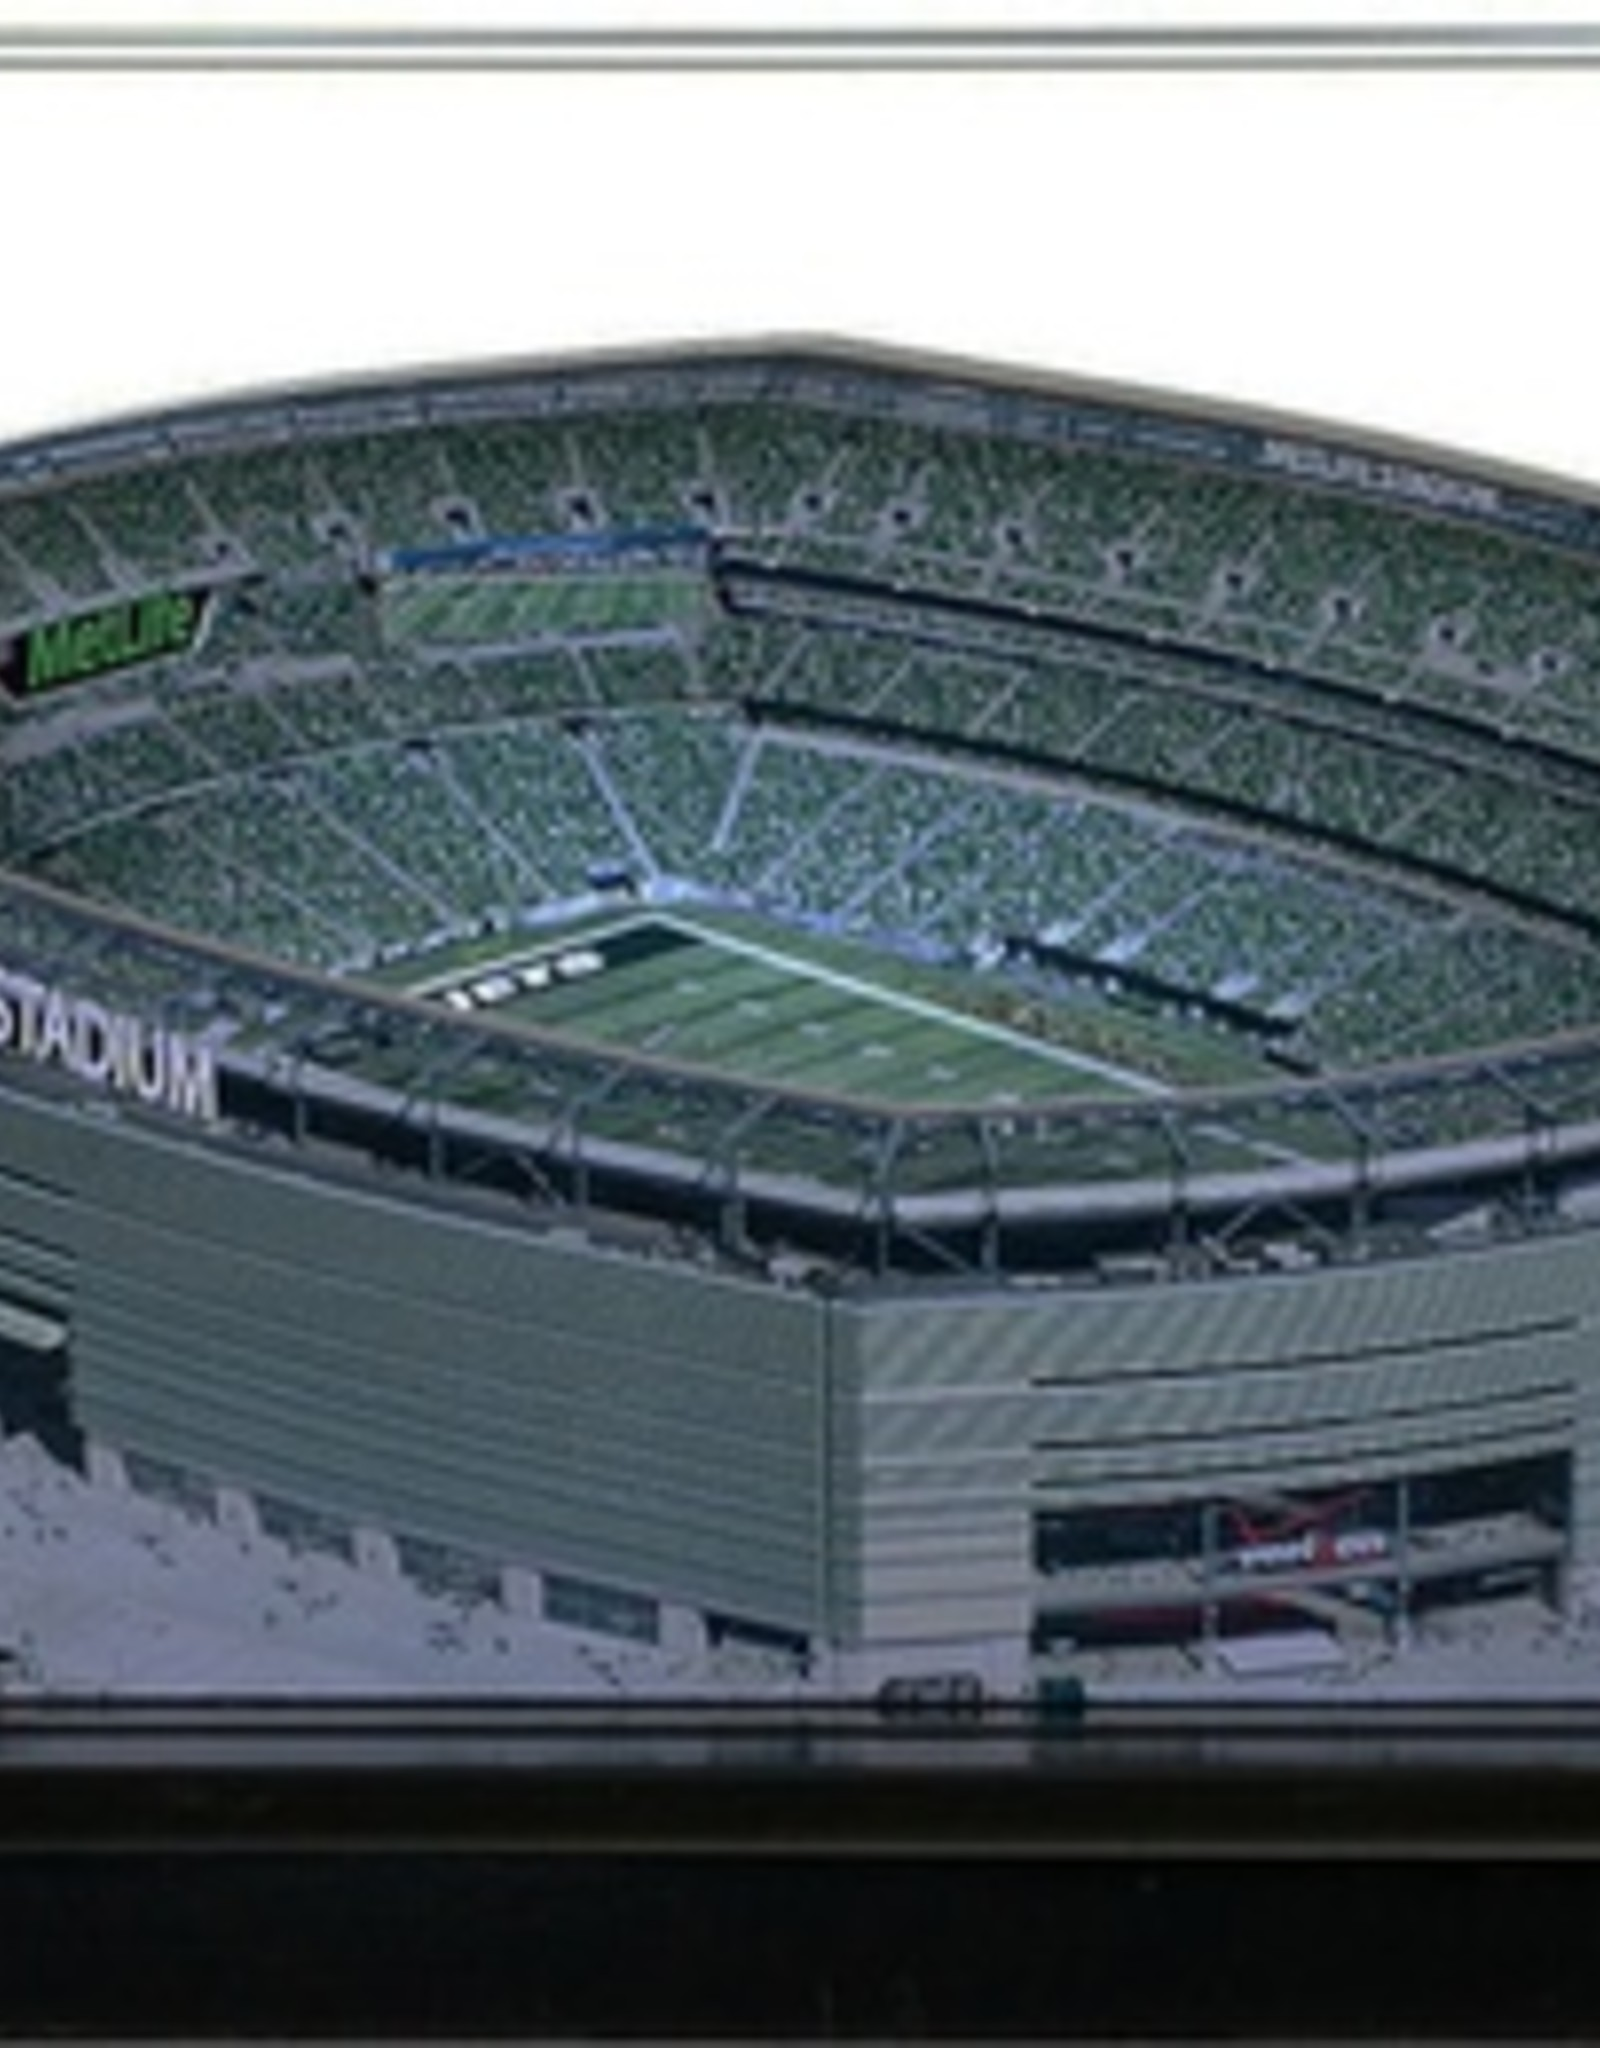 HOMEFIELDS New York Jets 9in Lighted Replica Metlife Stadium